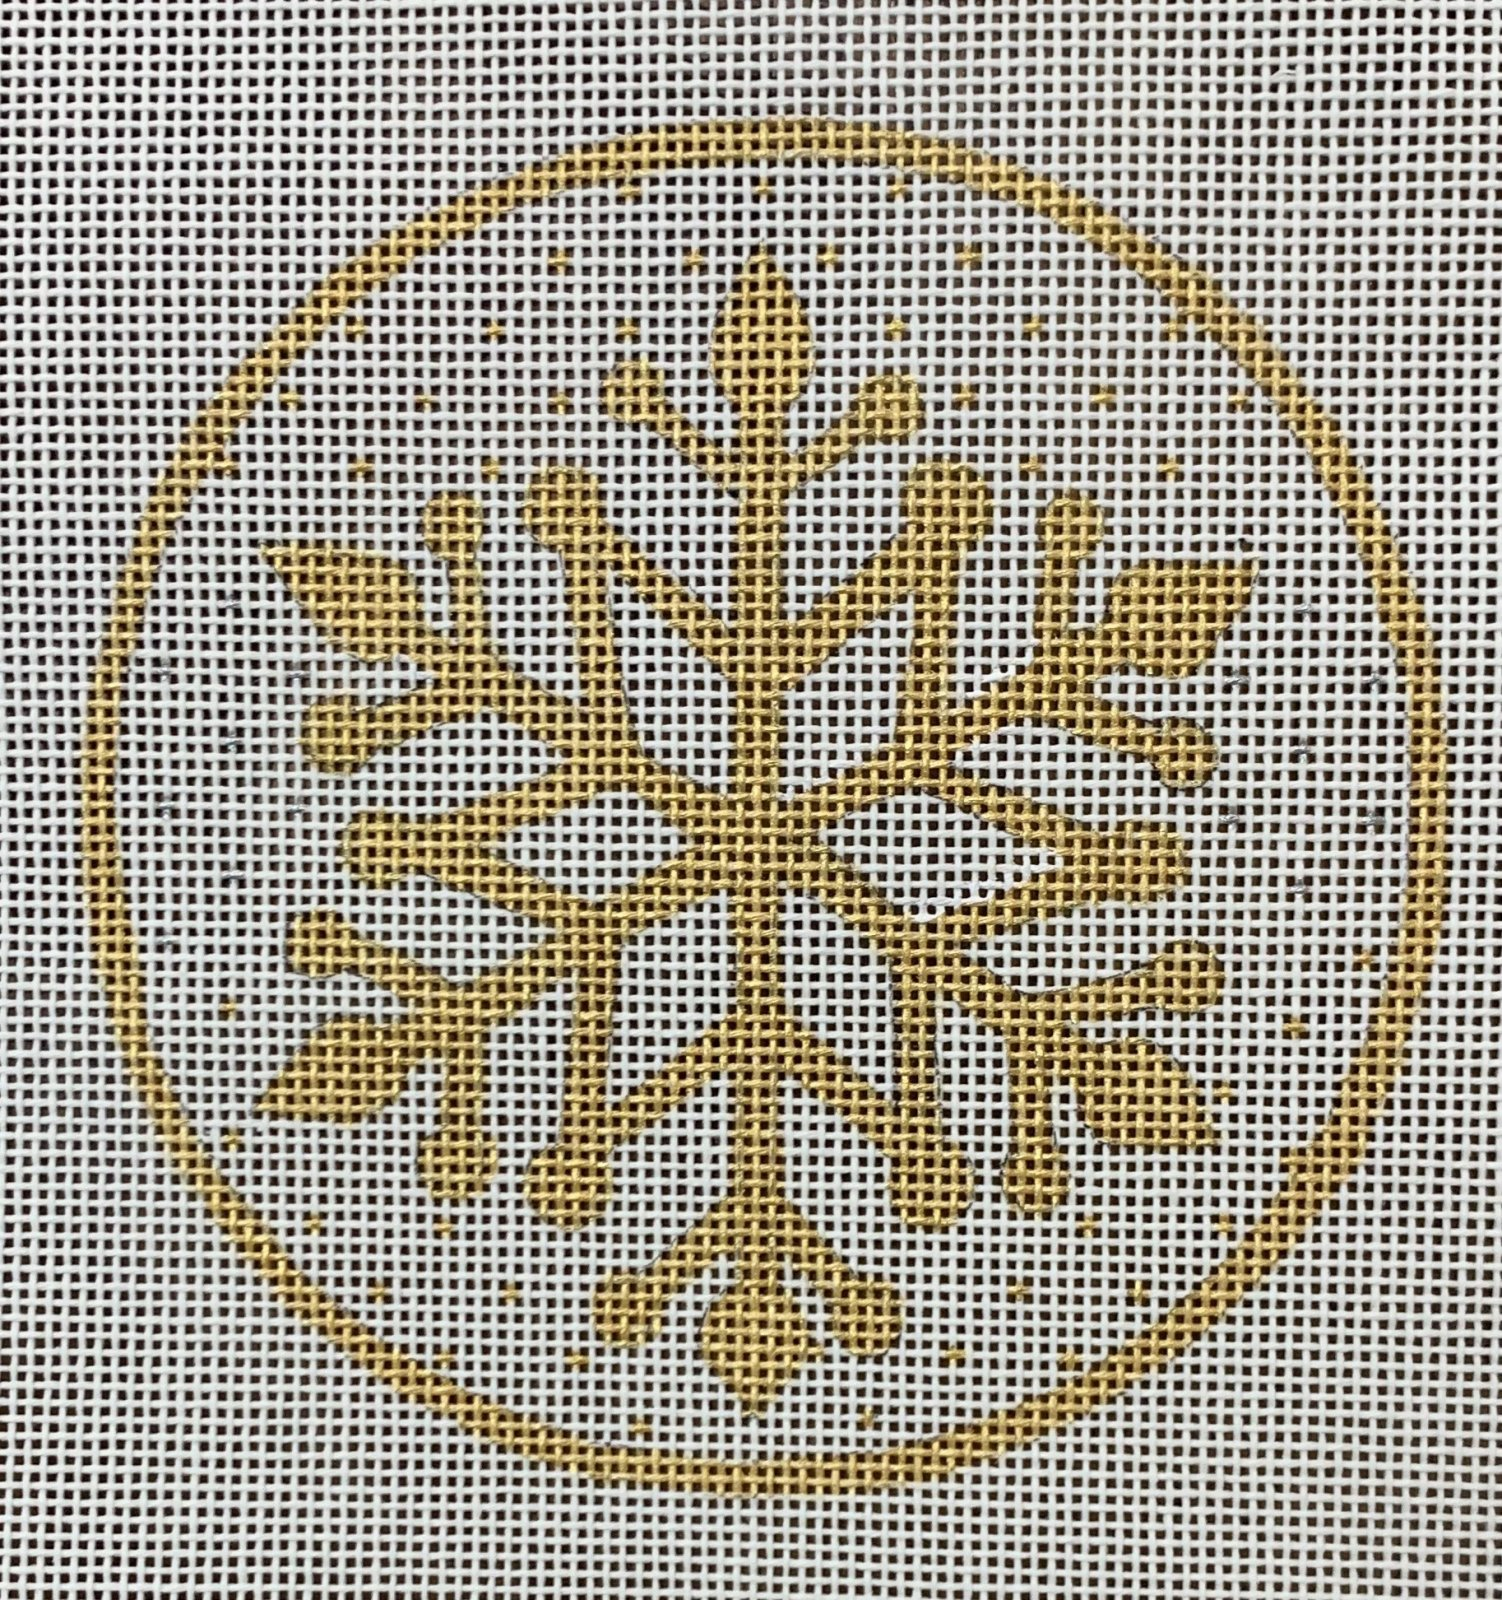 Gold Snowflake Ornament